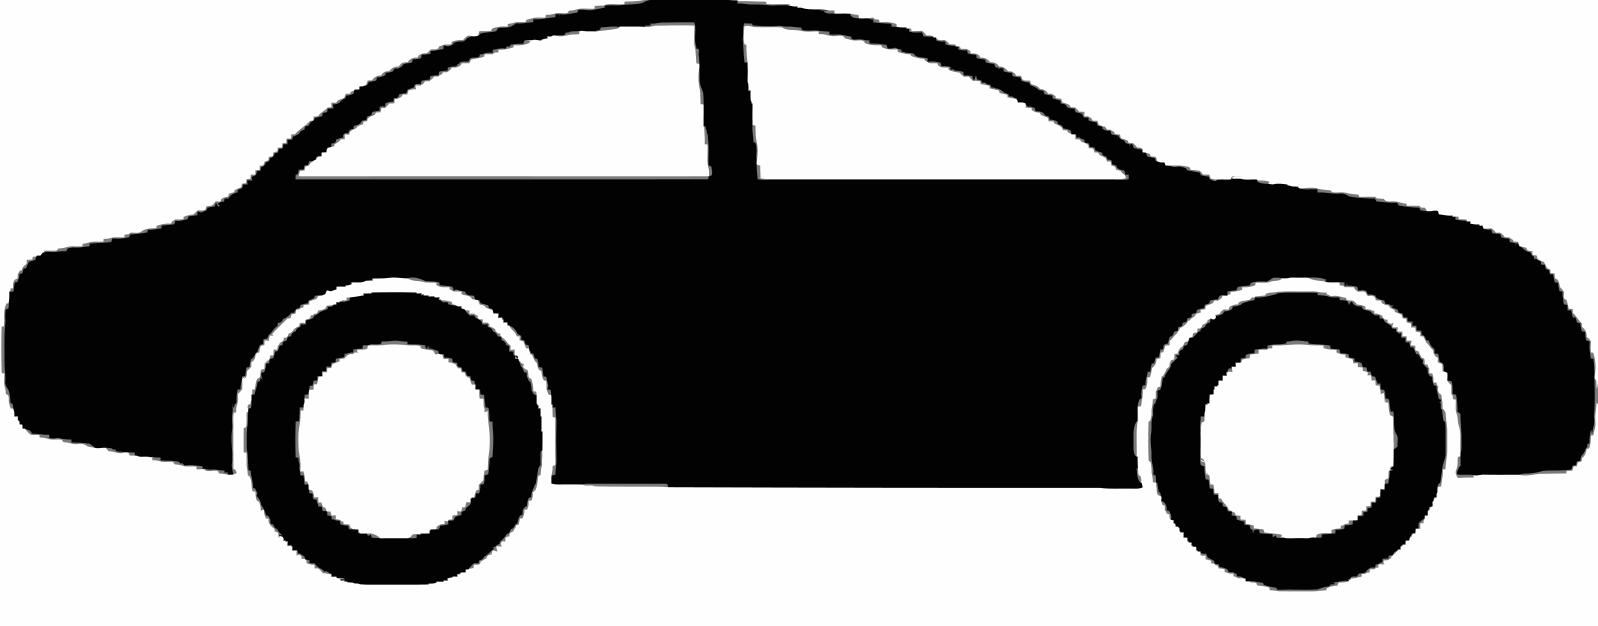 car silhouette vector free download at getdrawings com free for rh getdrawings com car vector art car vector japan